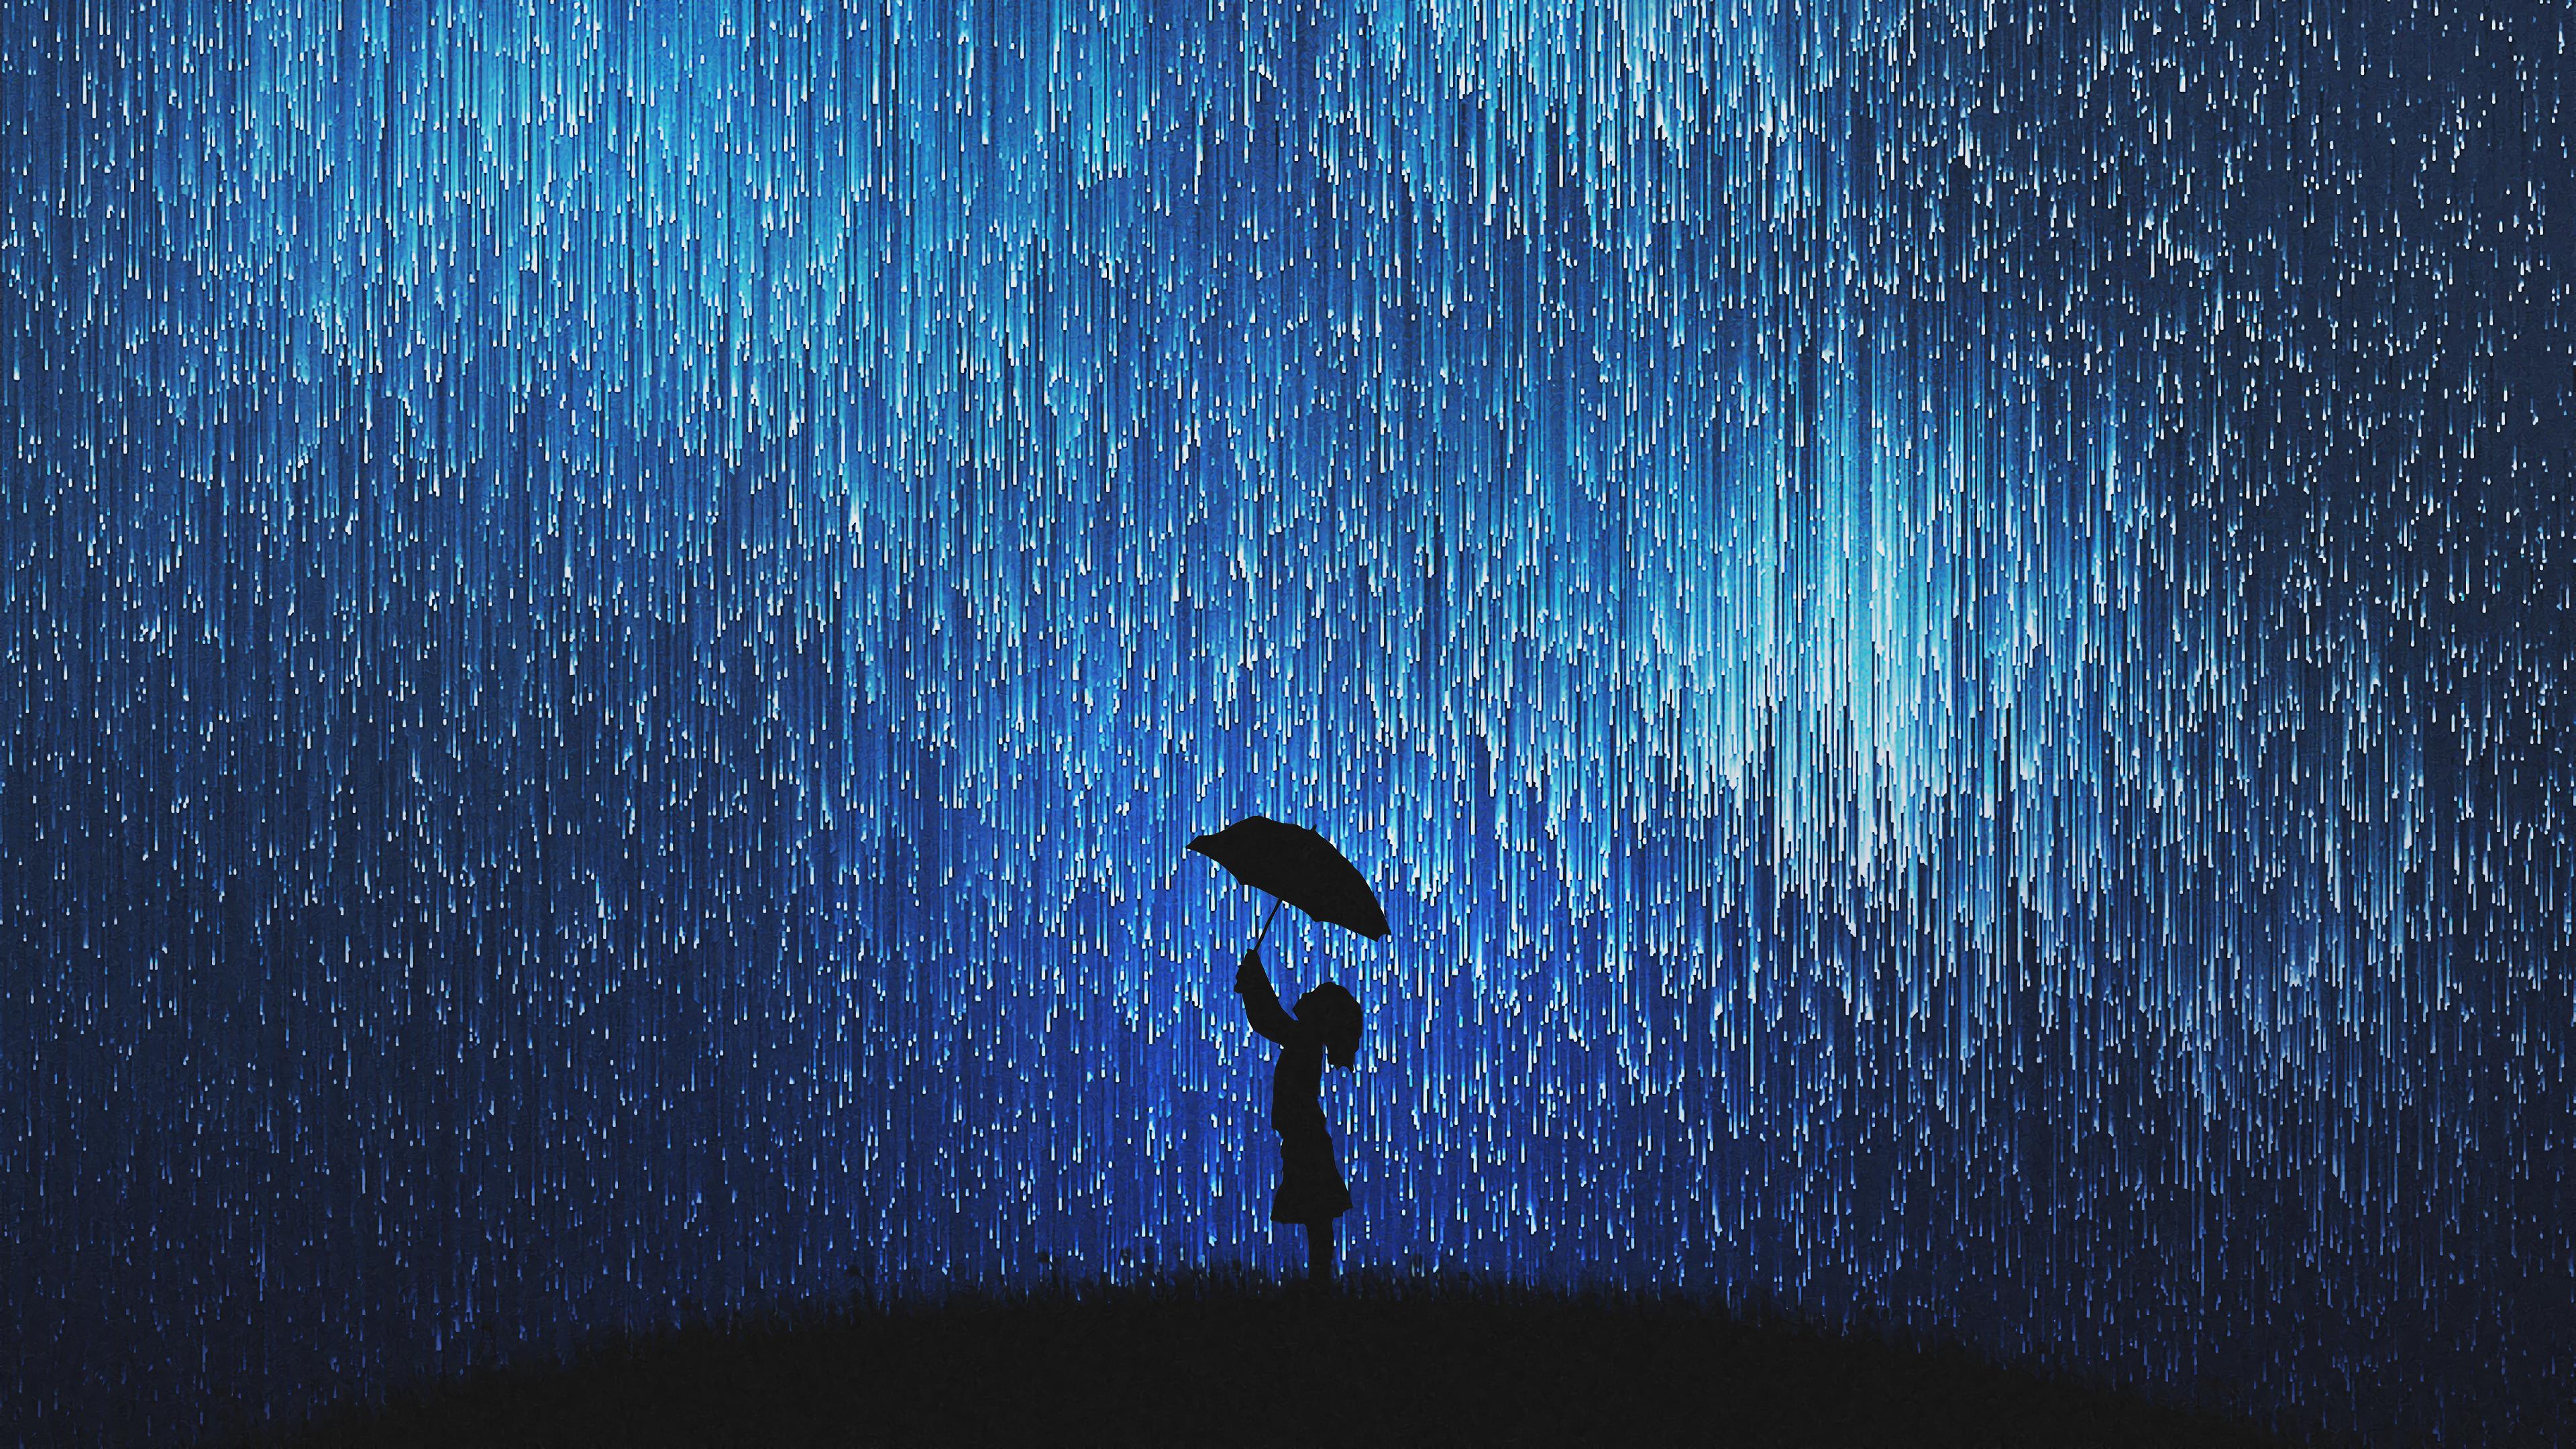 General 3840x2160 digital digital art artwork illustration landscape fantasy art silhouette dark people night sky night sky nature rain umbrella children fantasy girl women starry night stars starscape starred sky blue galaxy pixel sorting